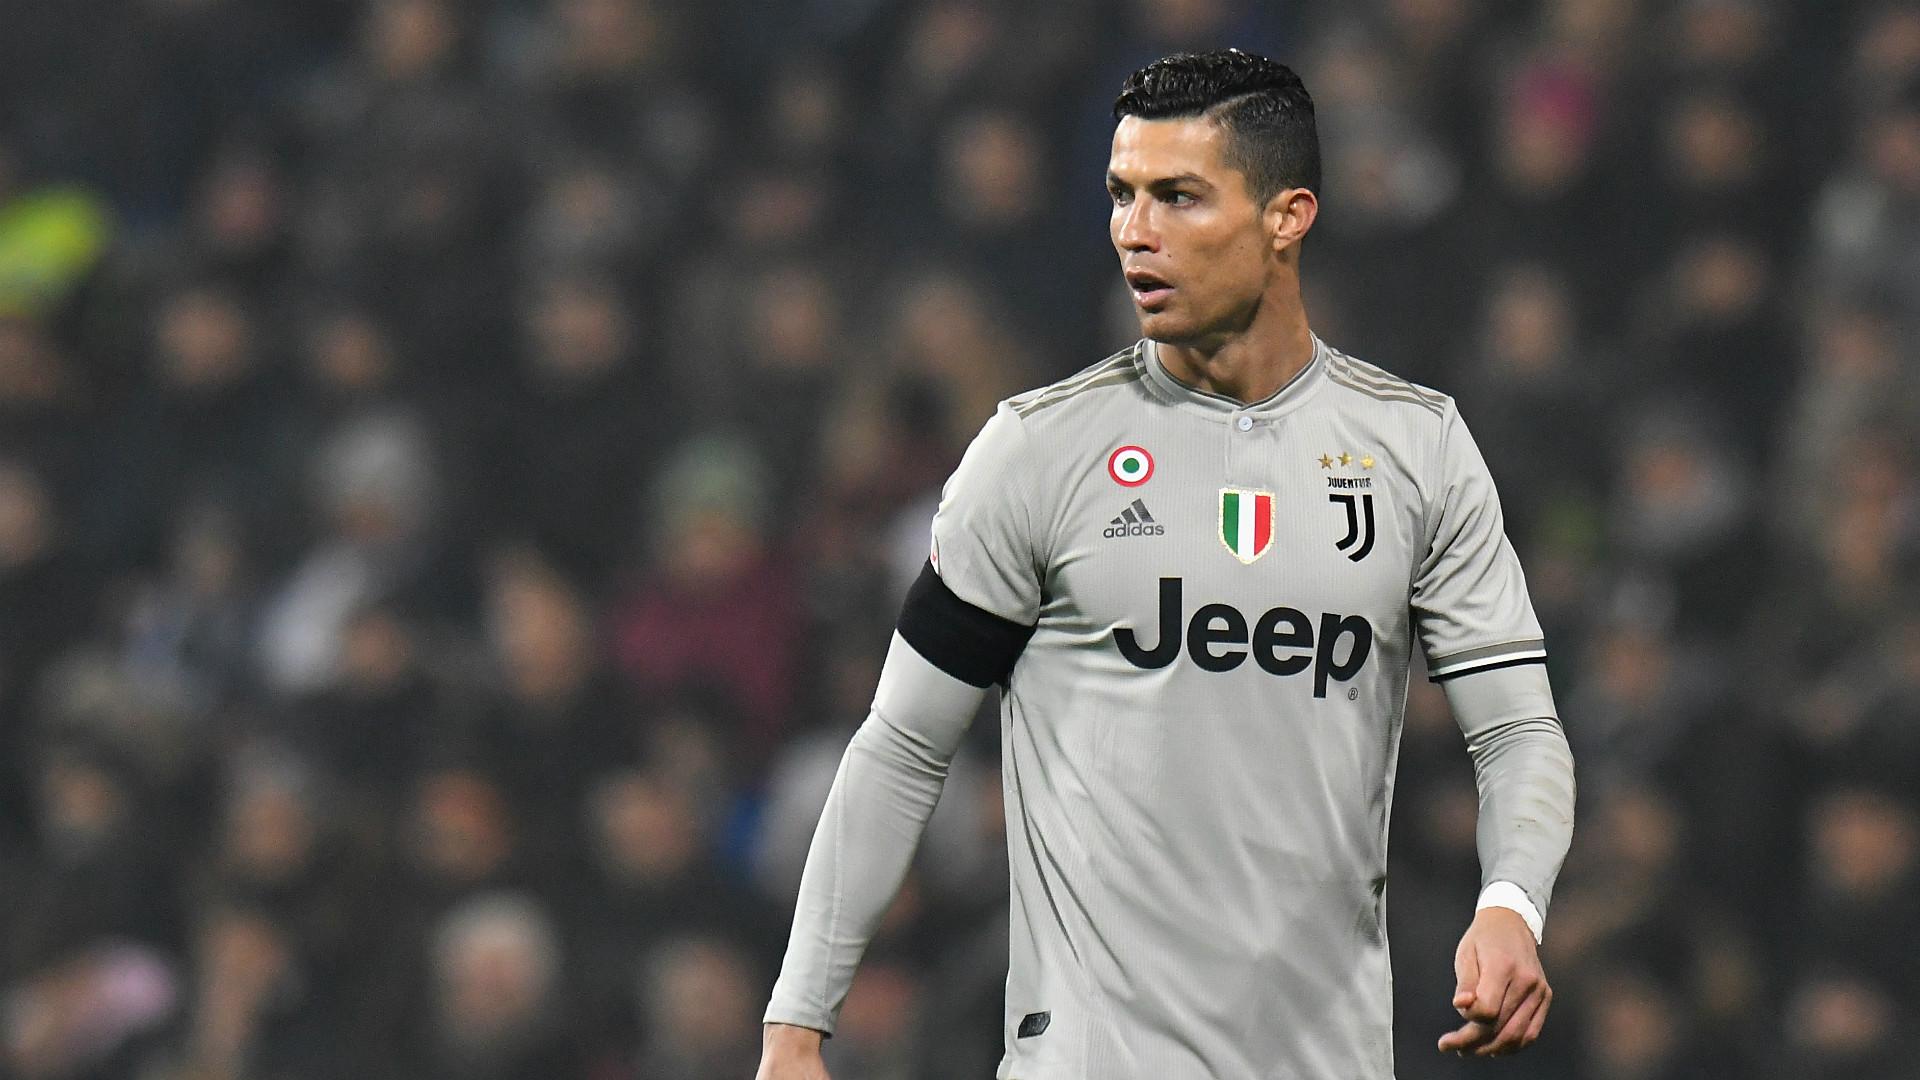 Cristiano Ronaldo news: Juventus striker's remarkable scorin